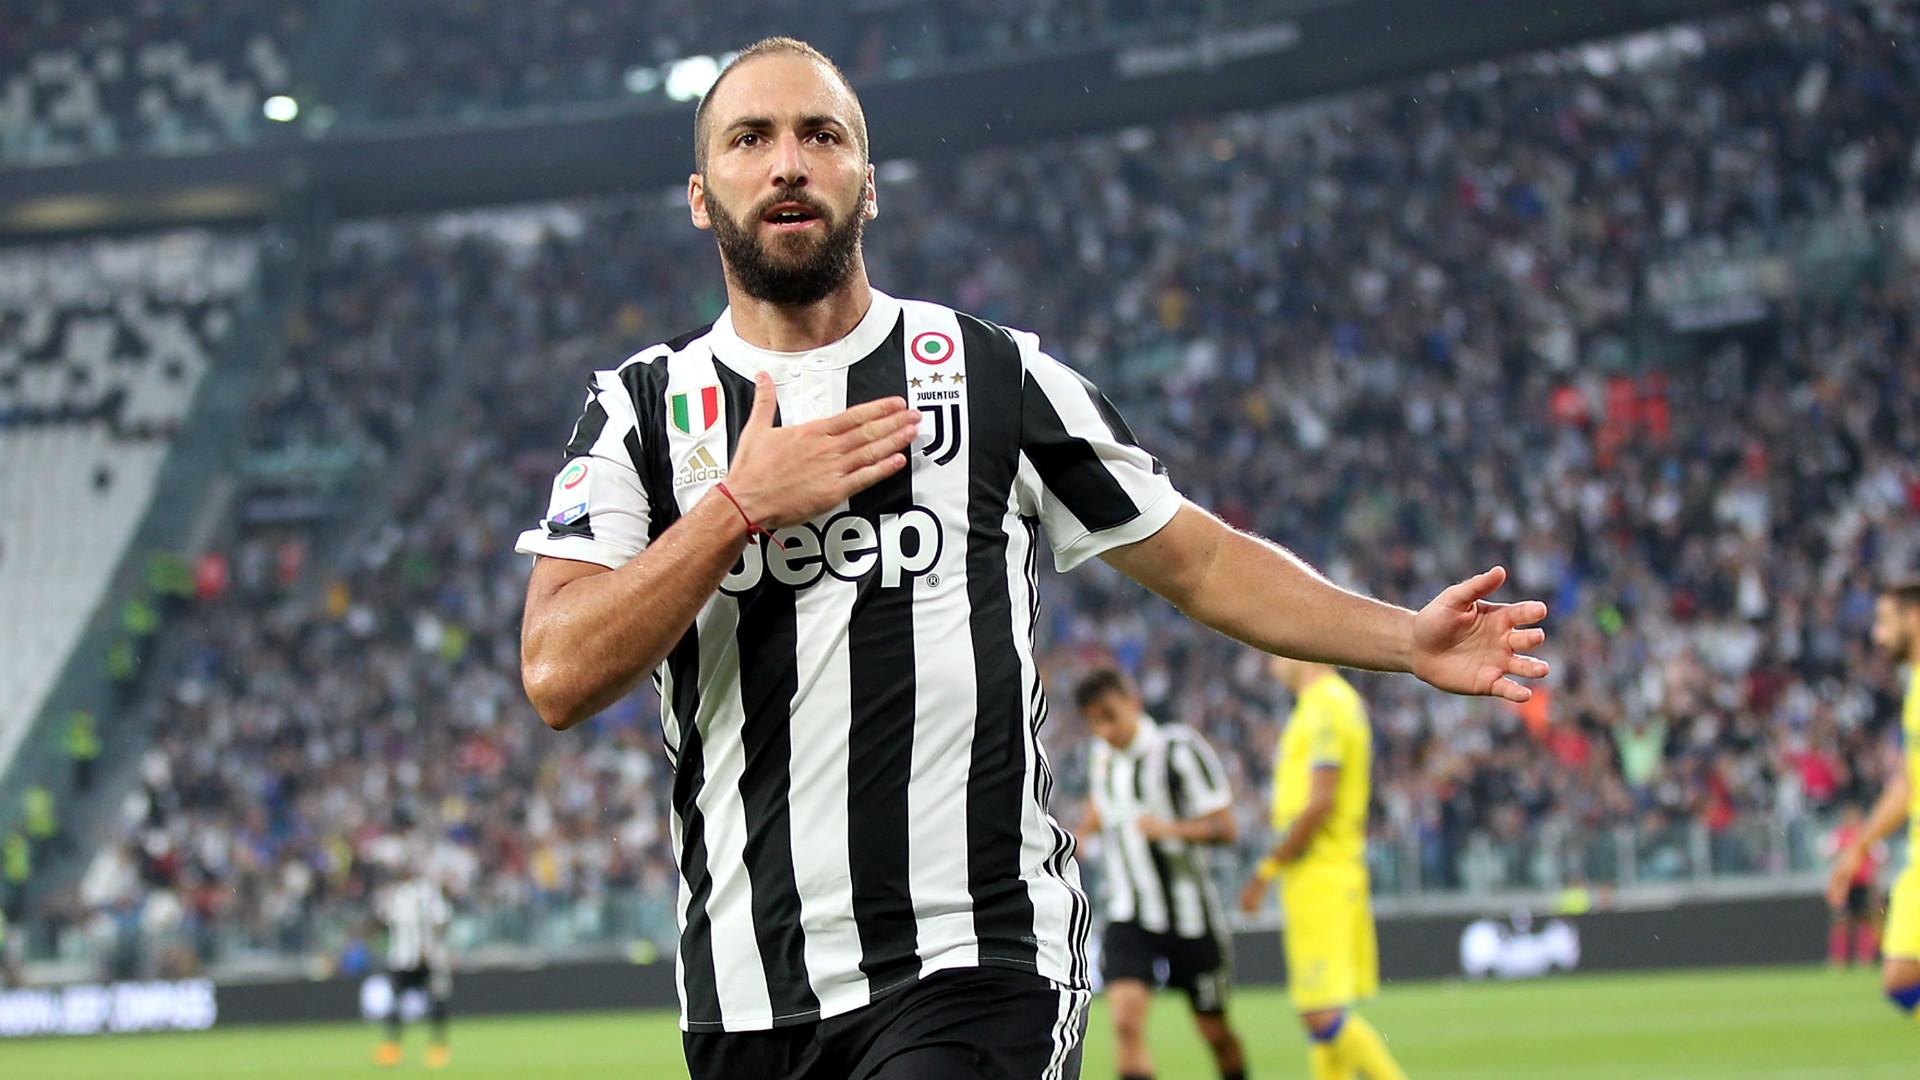 Juventus striker Gonzalo Higuain admits to modelling game on